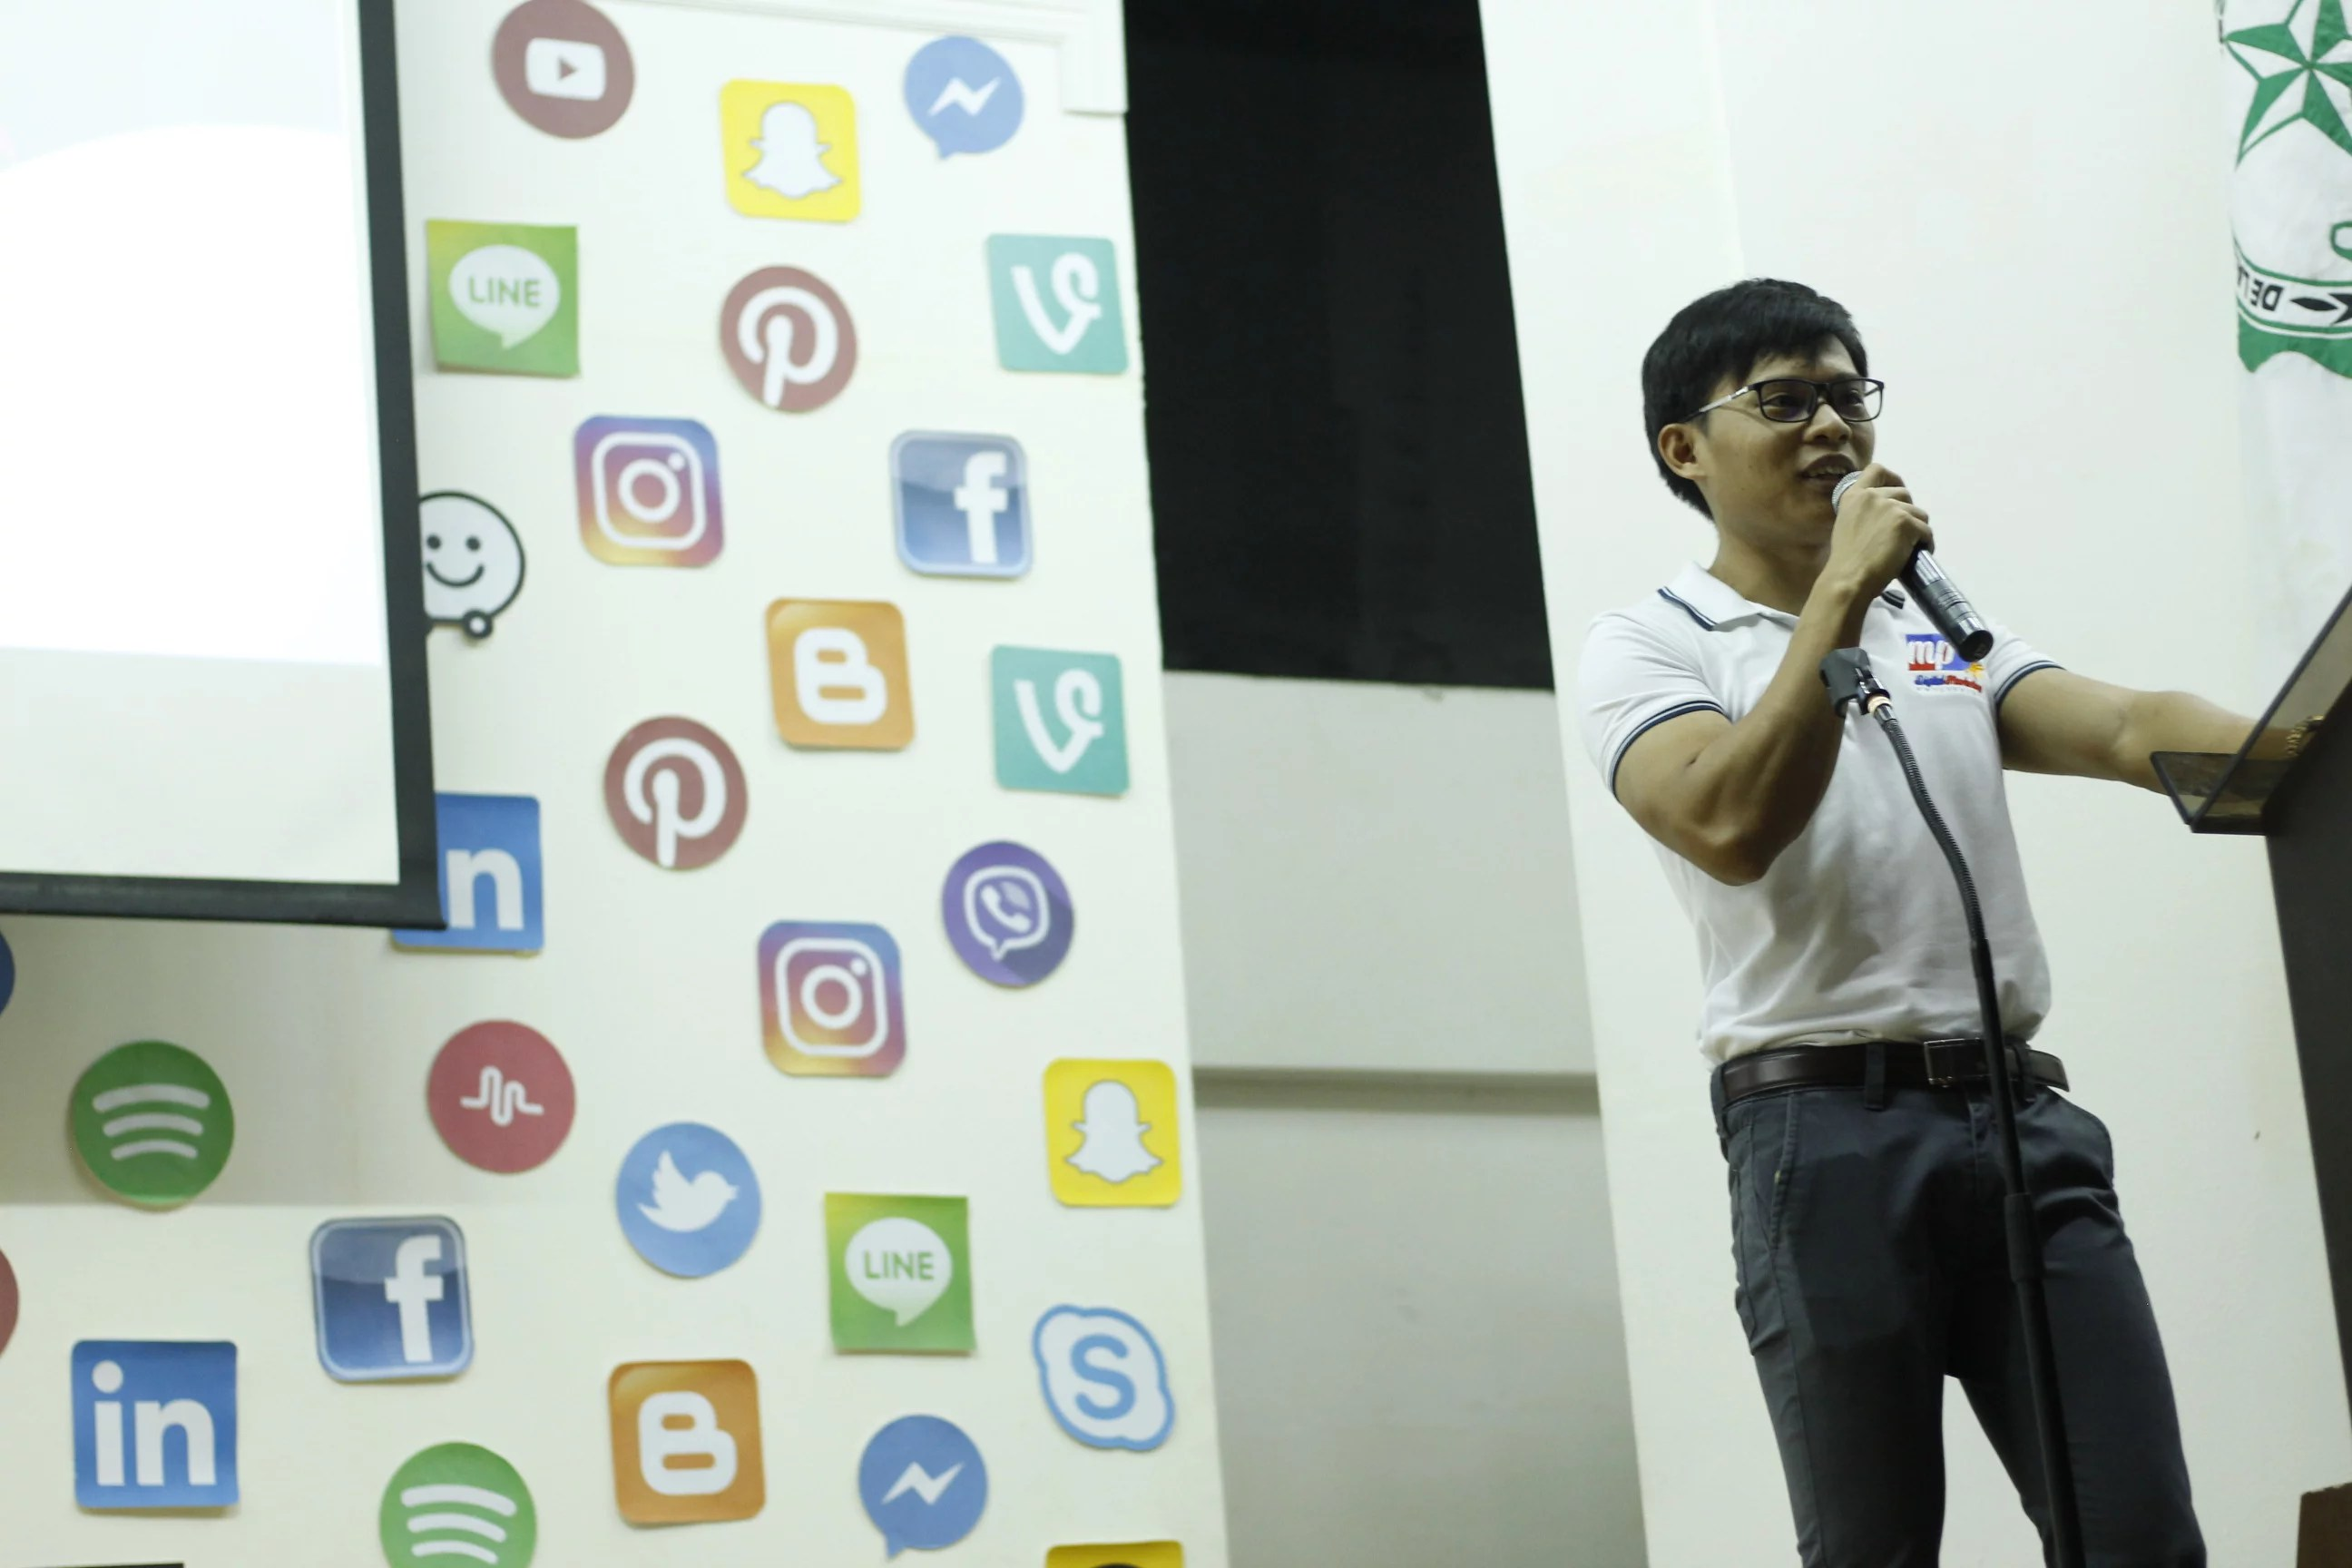 Of degree students, and more. Filipino Digital Marketing, SEO, Social Media Speaker ...